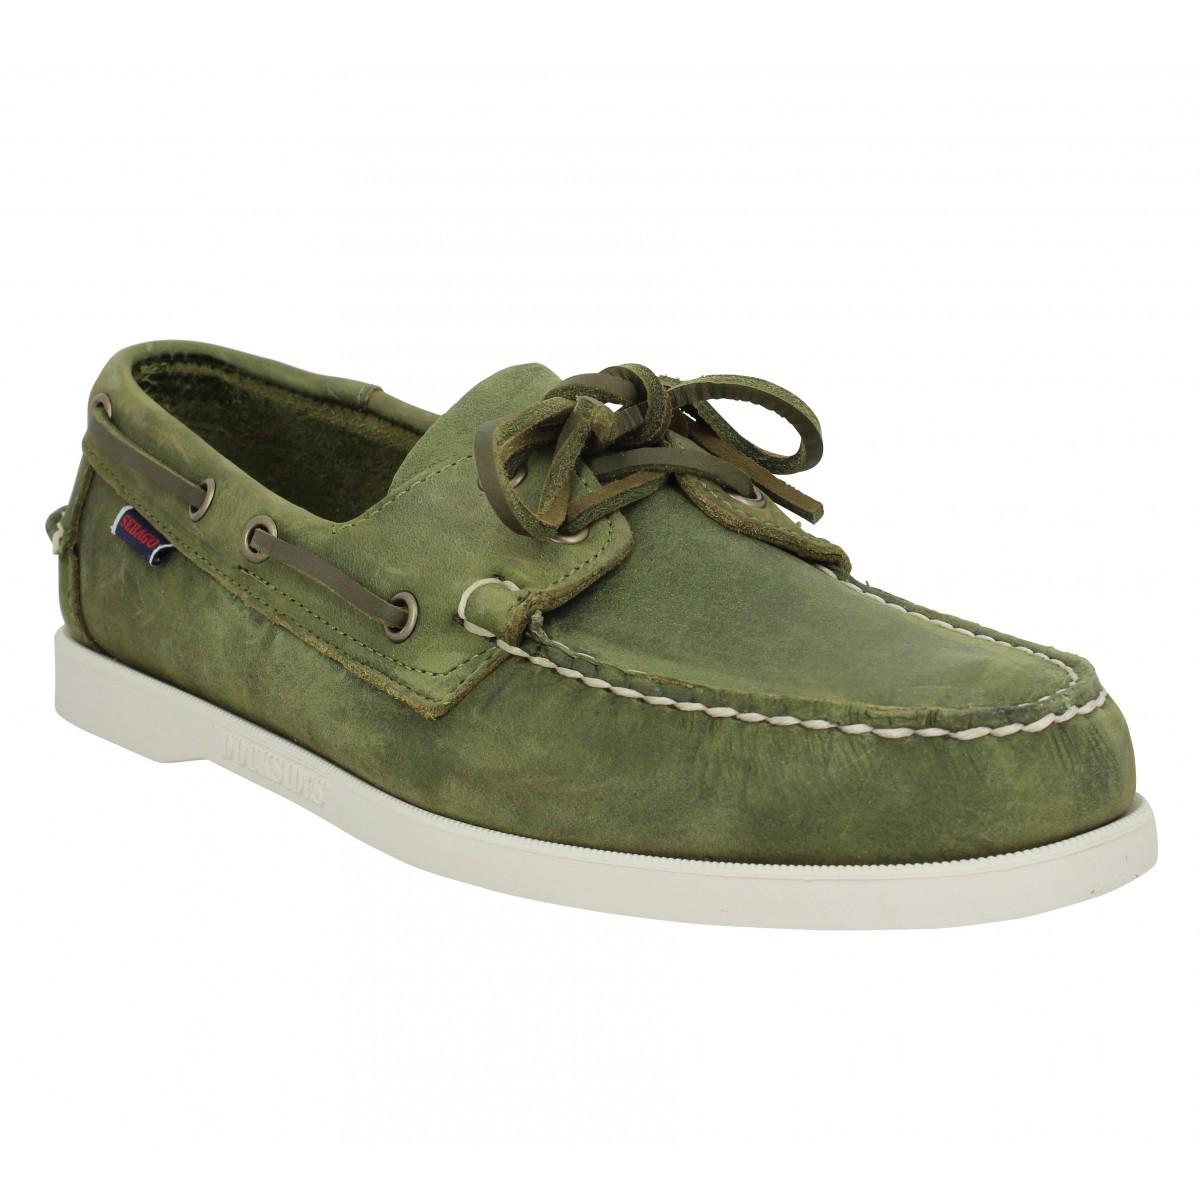 Chaussures bateaux SEBAGO Docksides Portland cuir crazy Homme Green Military